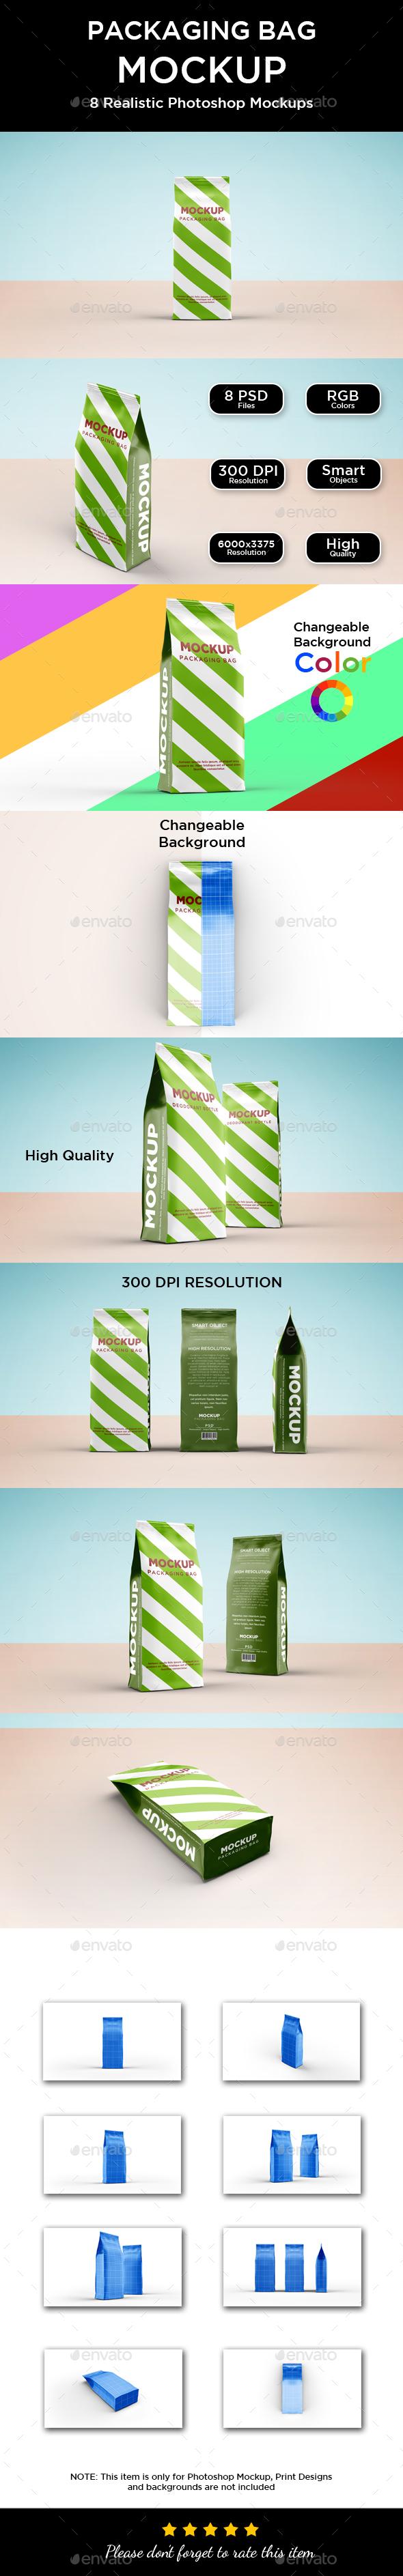 Packaging Paper Bag Mockup - Packaging Product Mock-Ups